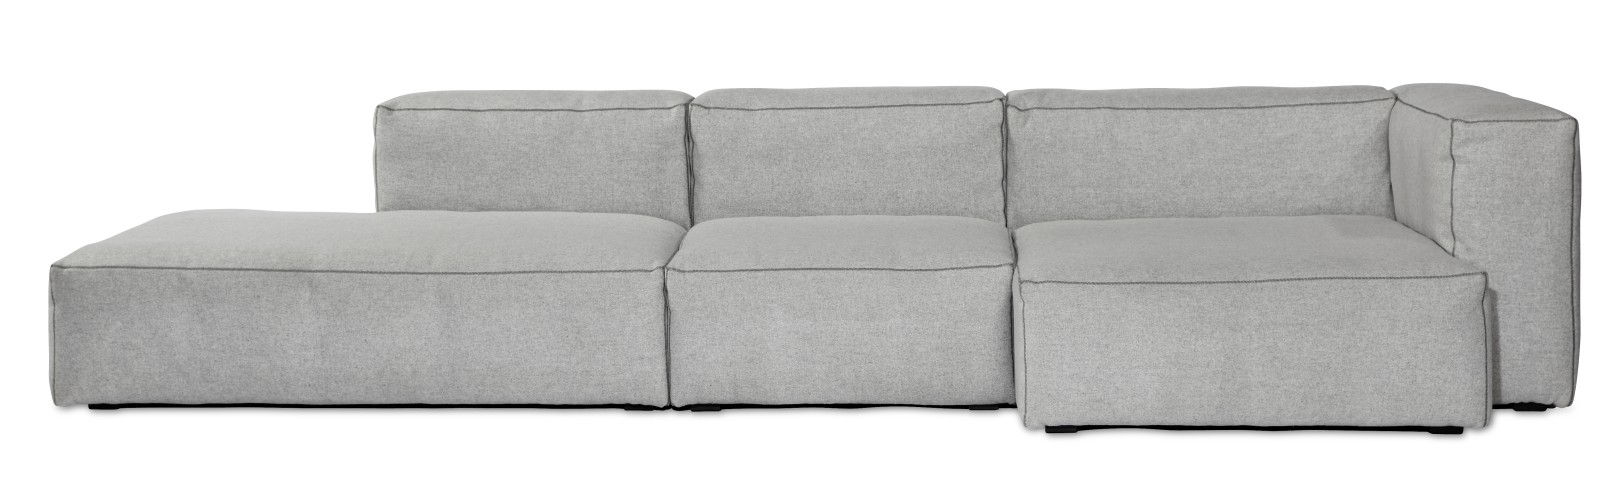 Mags Soft Lounge Modular Seating Element S9301 - Left Divina Melange 2 120